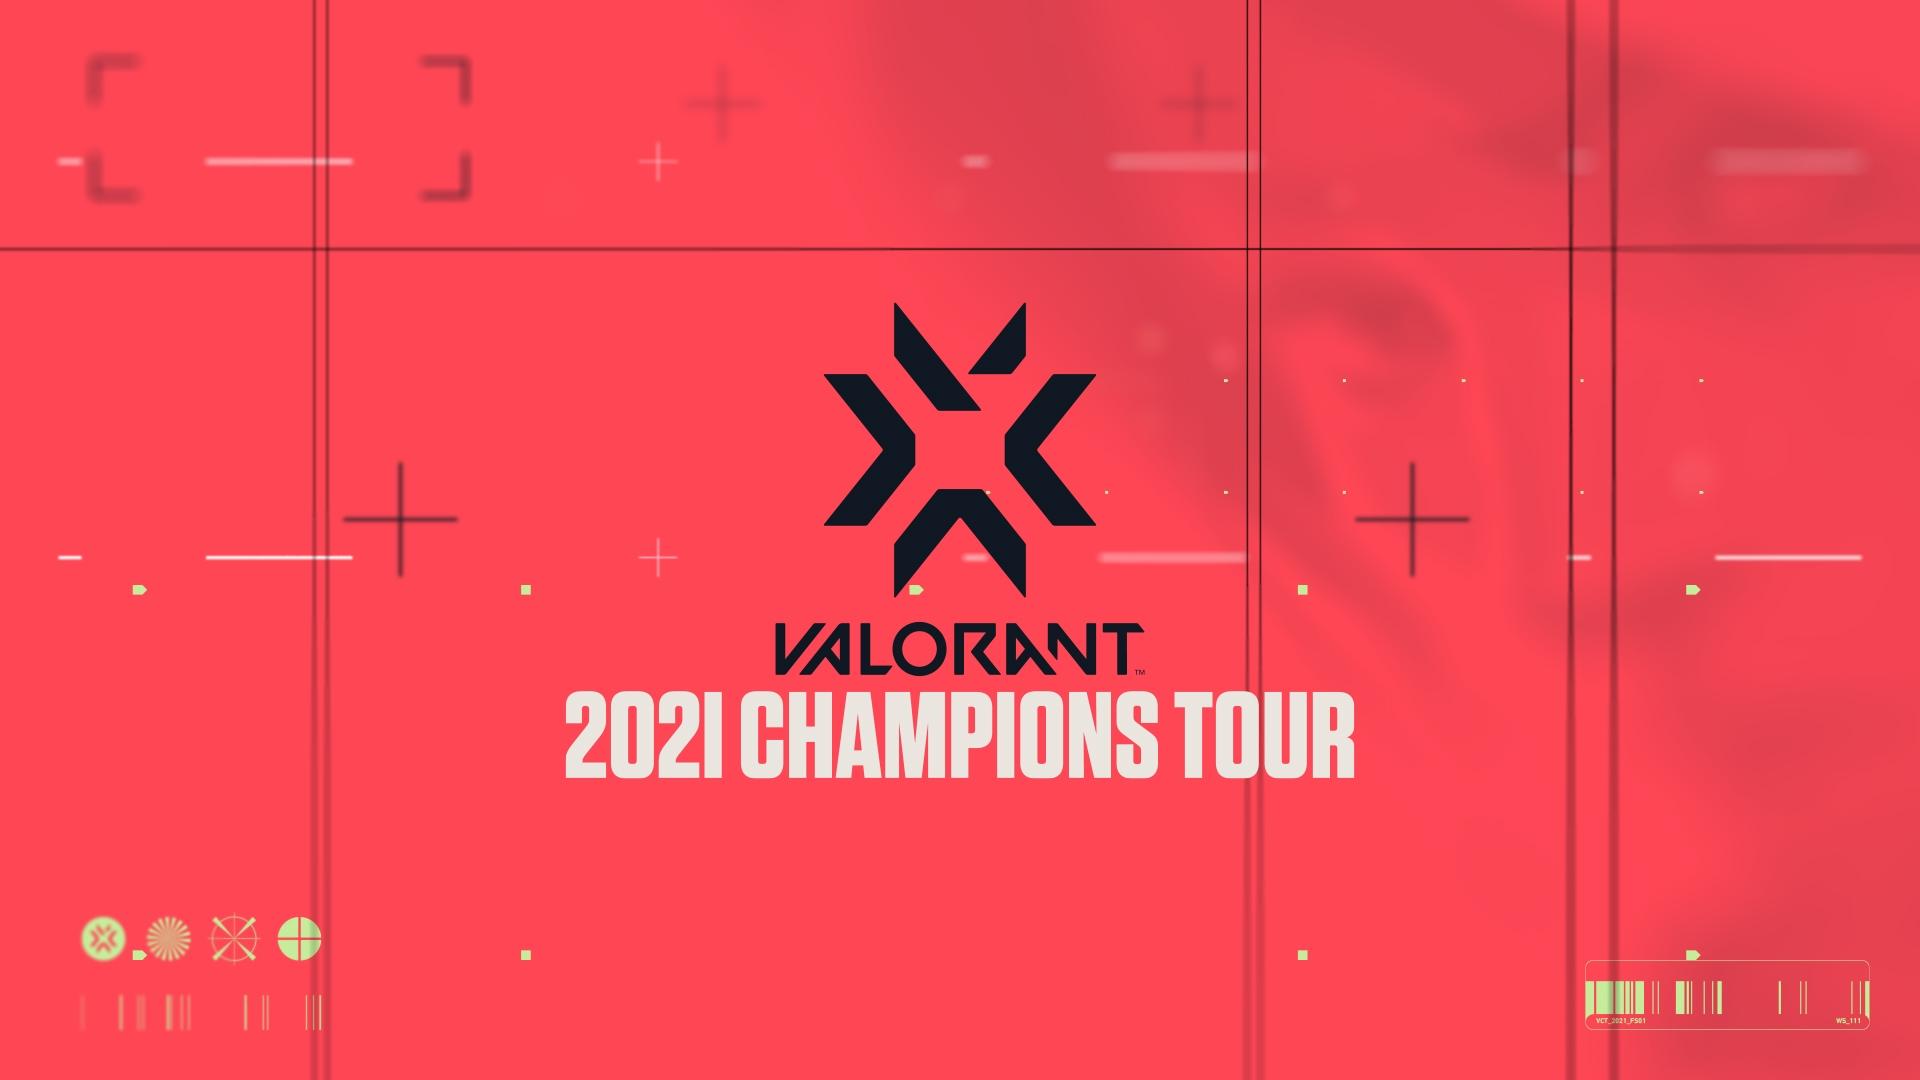 「2021 VALORANT Champions Tour」開催のお知らせ